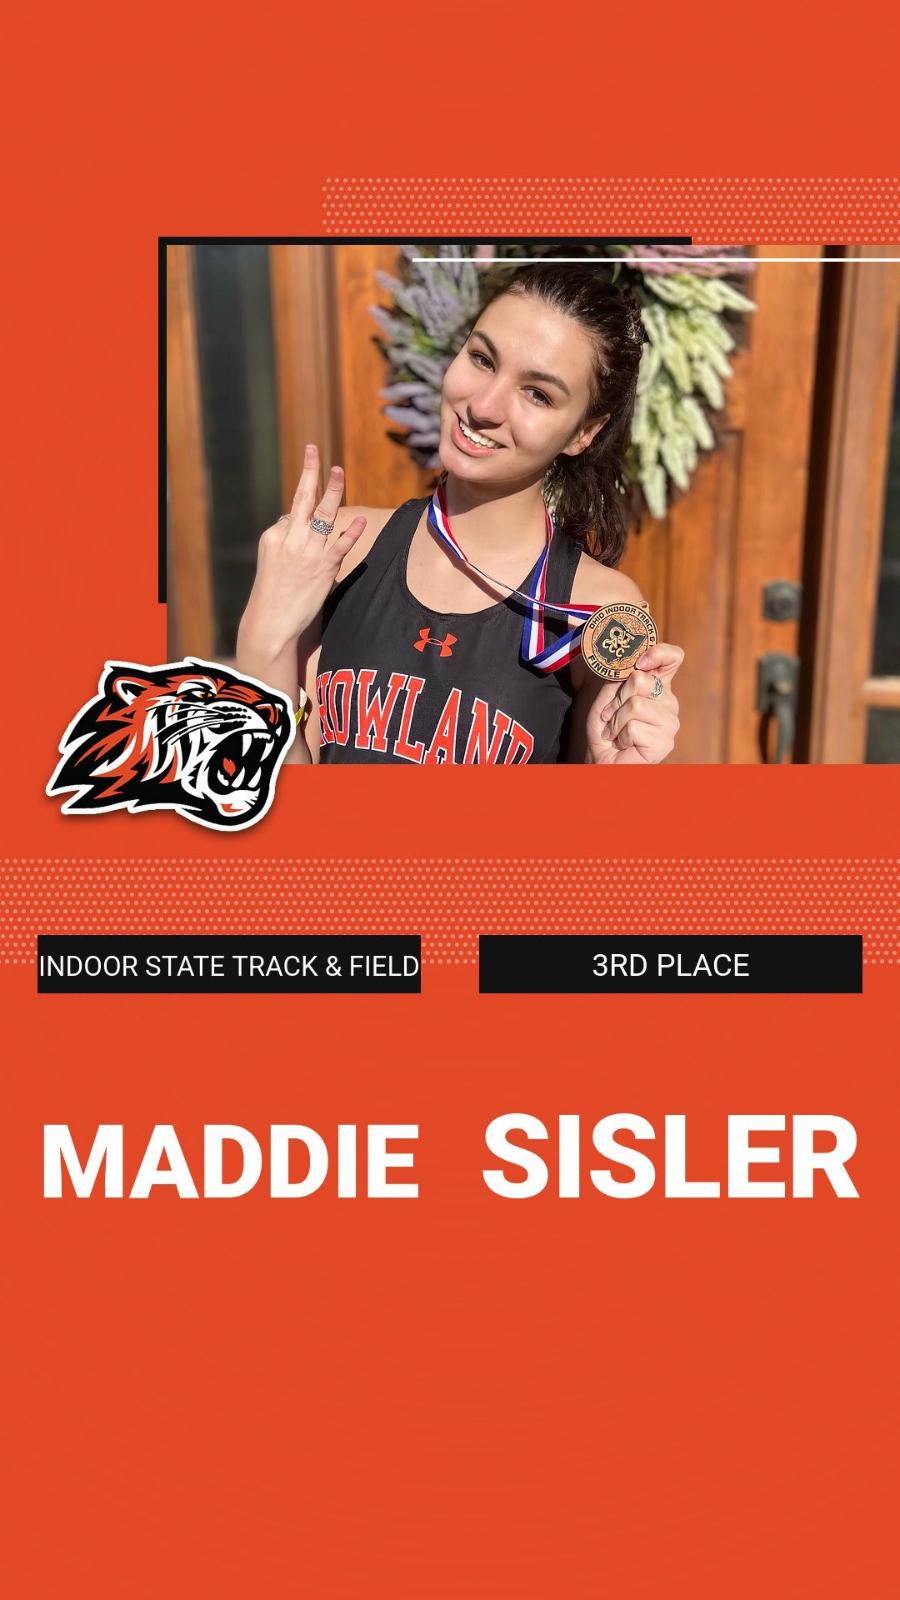 Maddie Sisler takes 3rd in High Jump at Indoor State Meet!